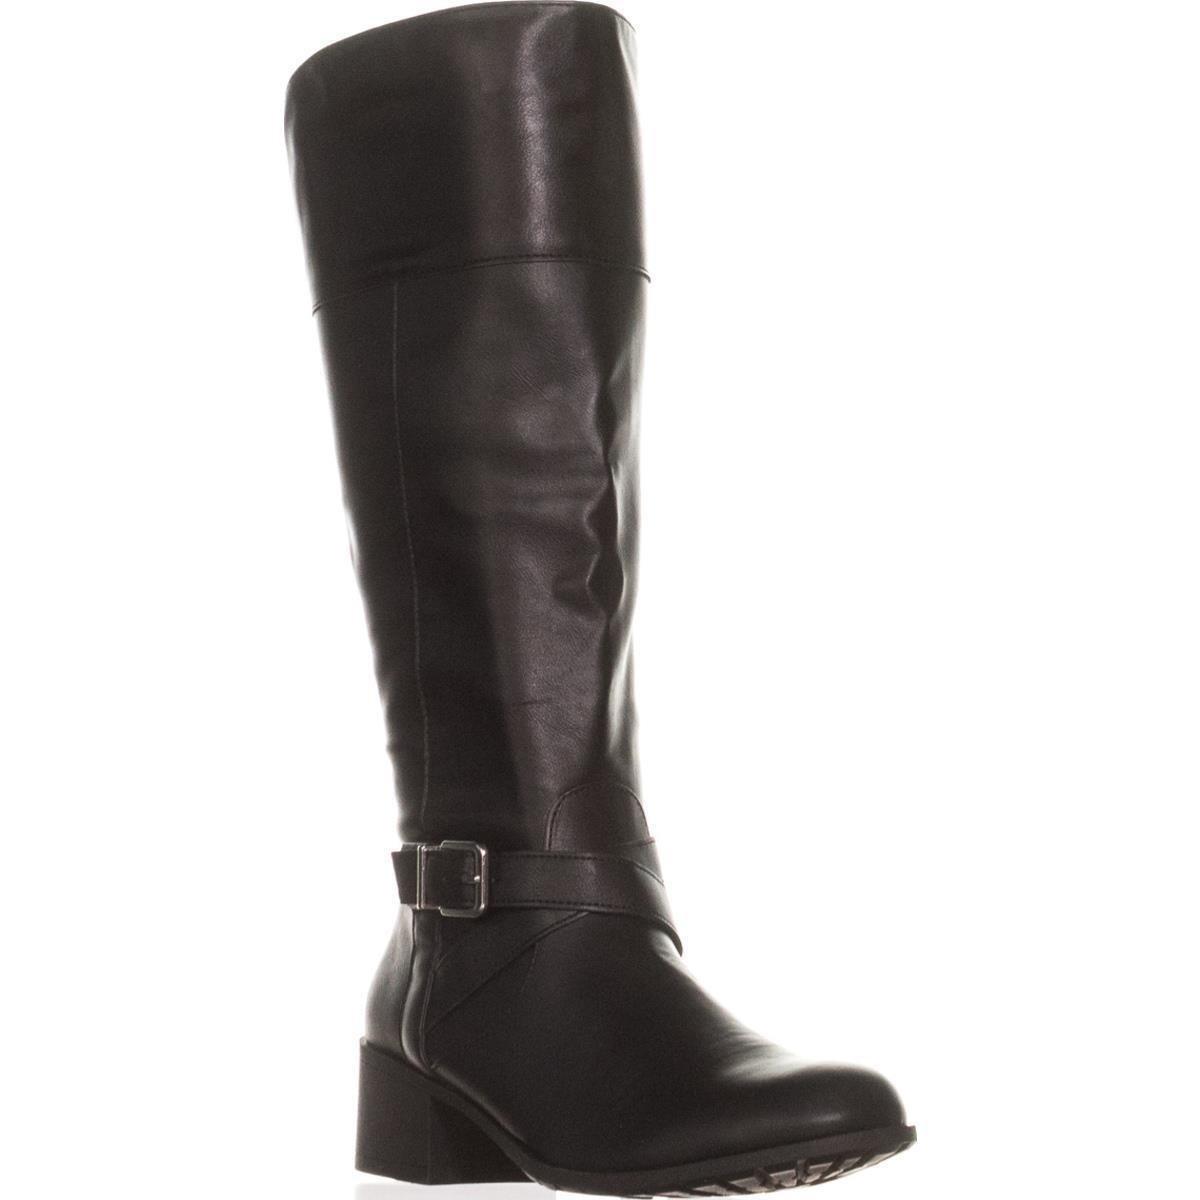 0fbd187c399 Womens Venesa Round Toe Knee High Fashion Boots